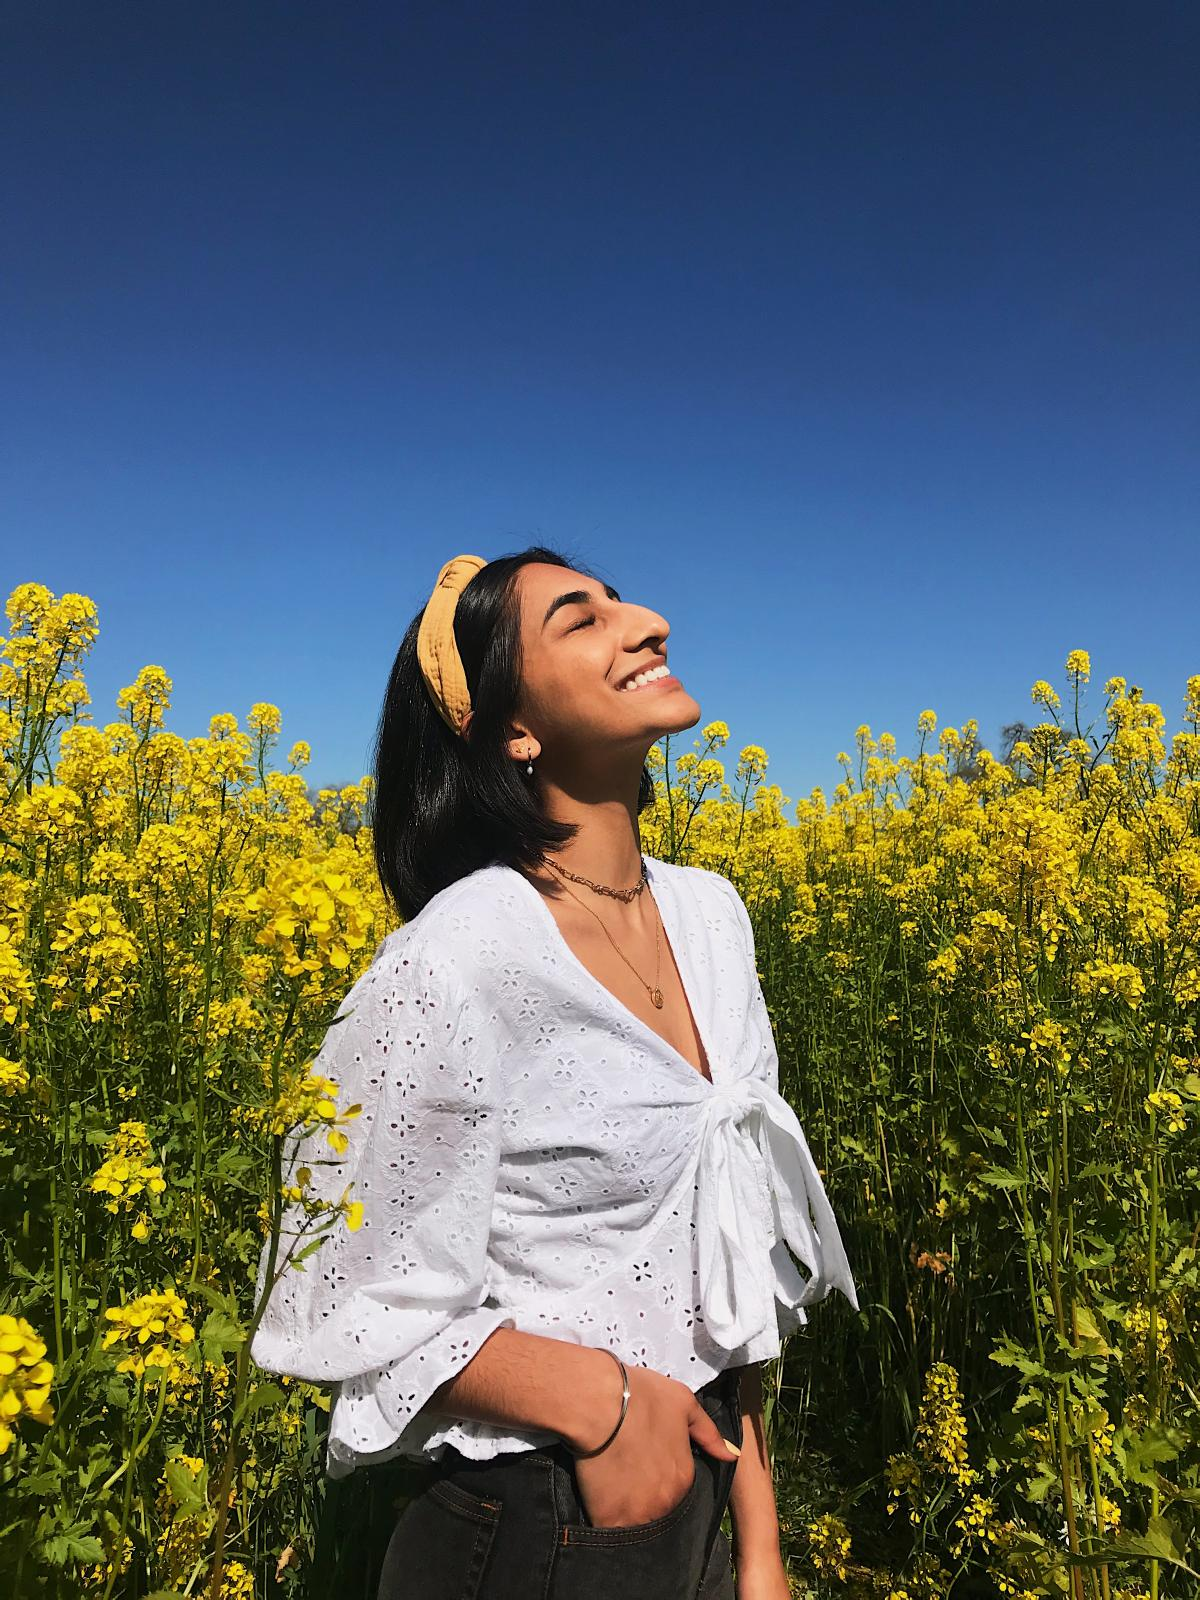 Portrait of Avneet Bhullar smiling in a field of flowers